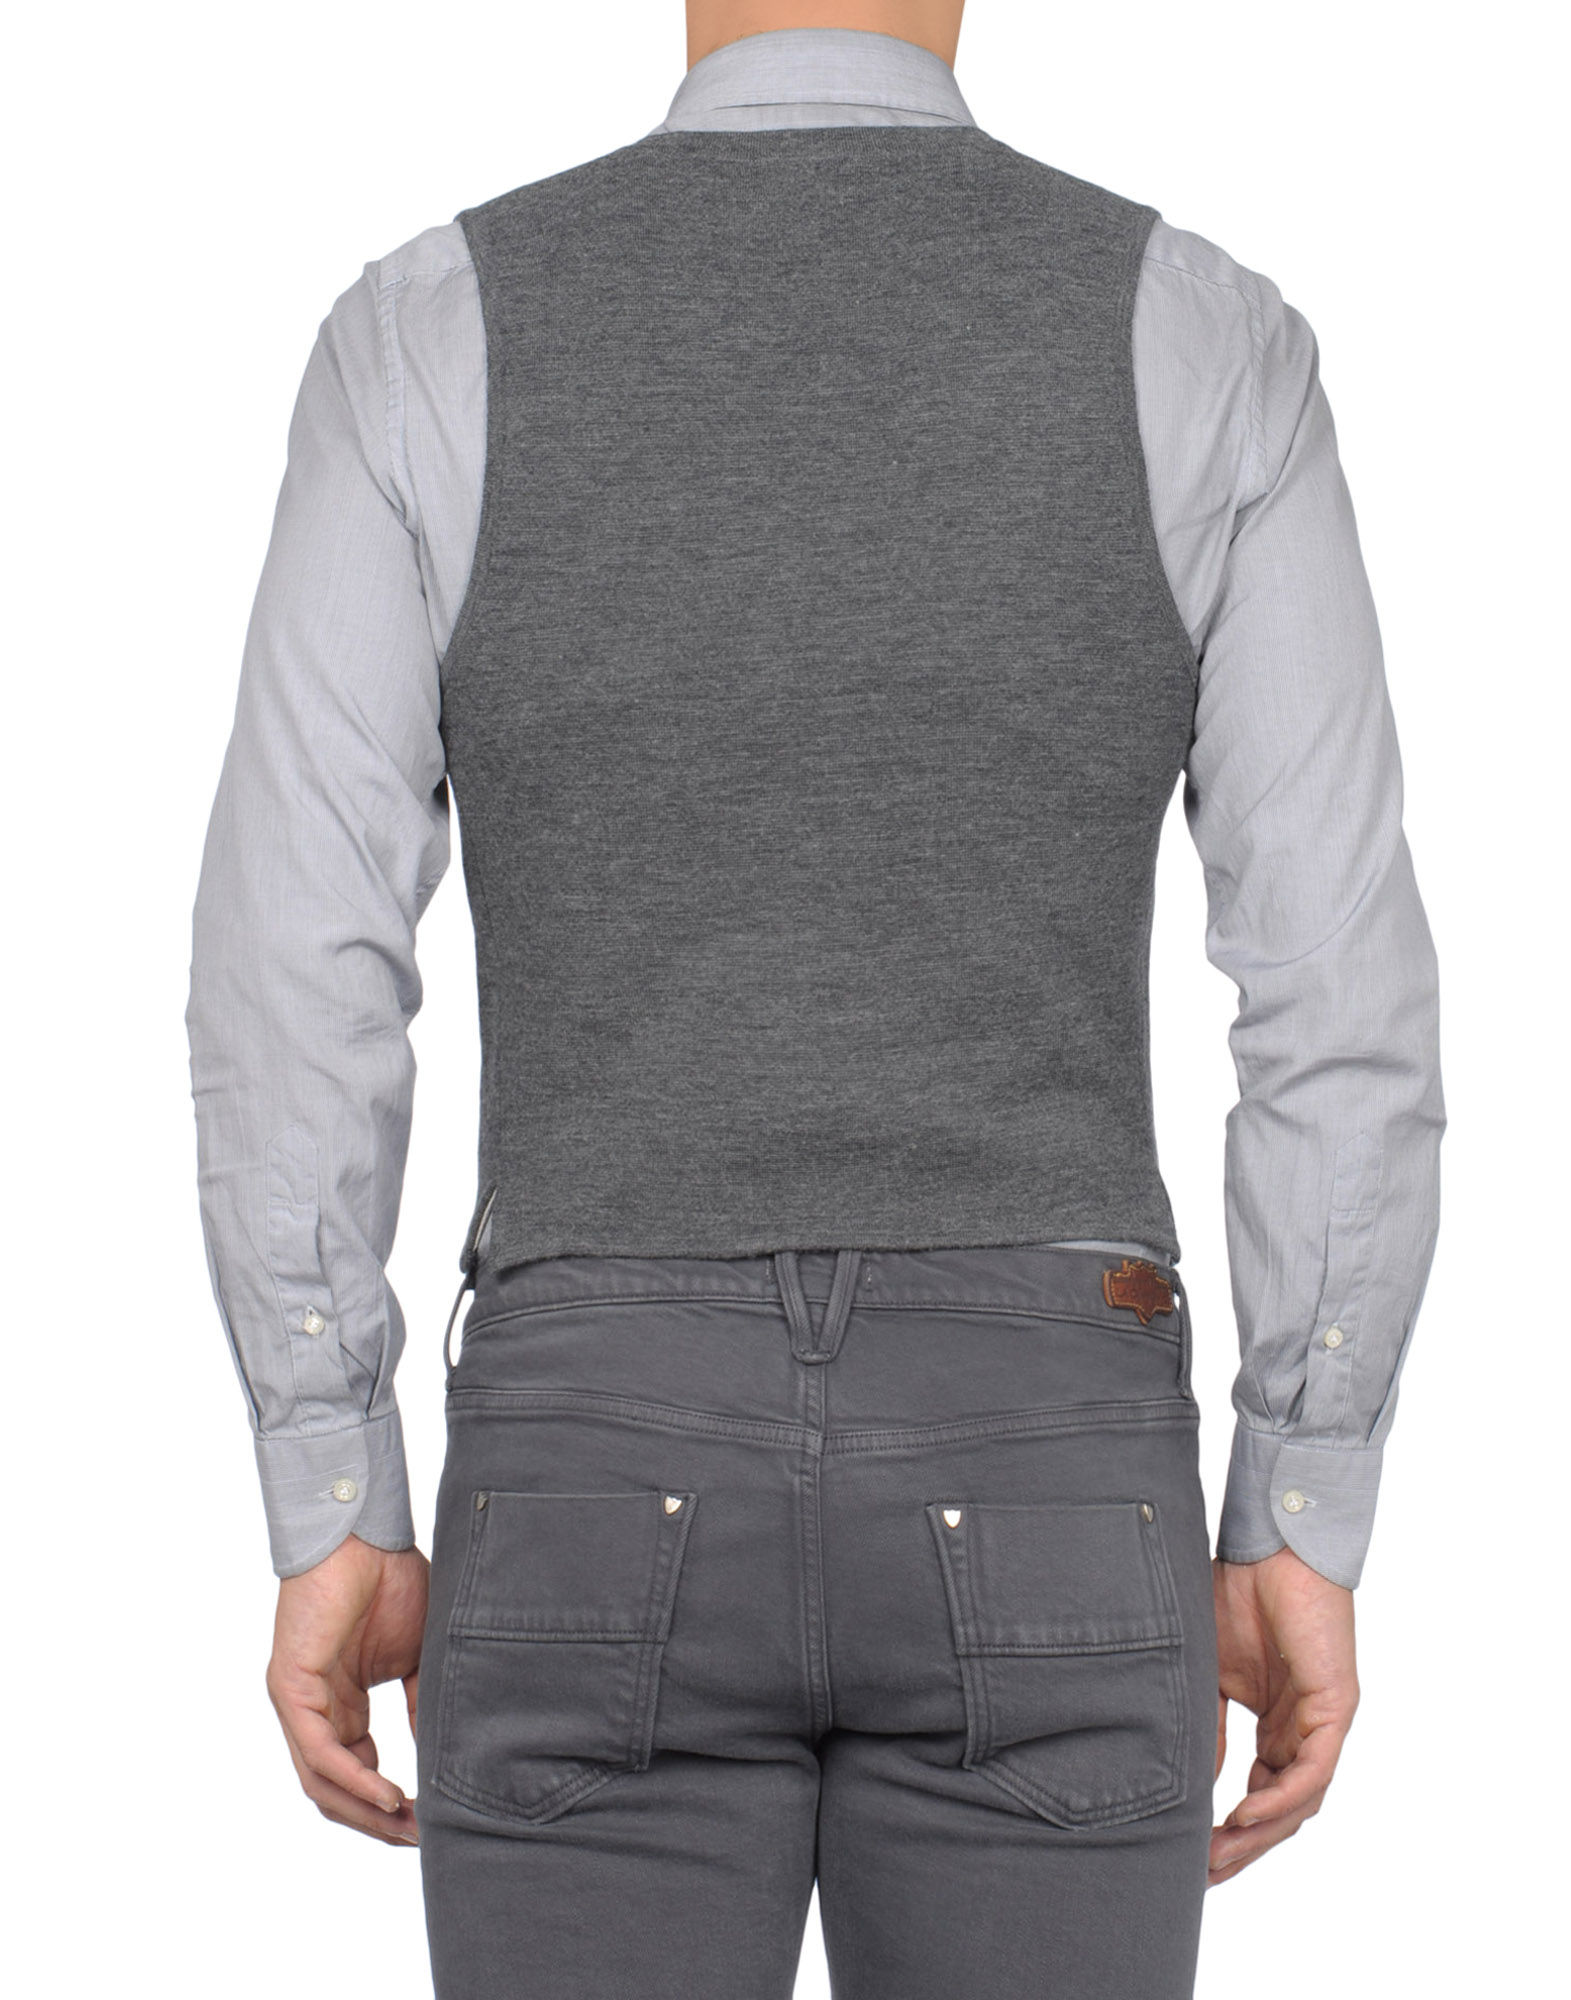 lyst scotch soda vest in gray for men. Black Bedroom Furniture Sets. Home Design Ideas